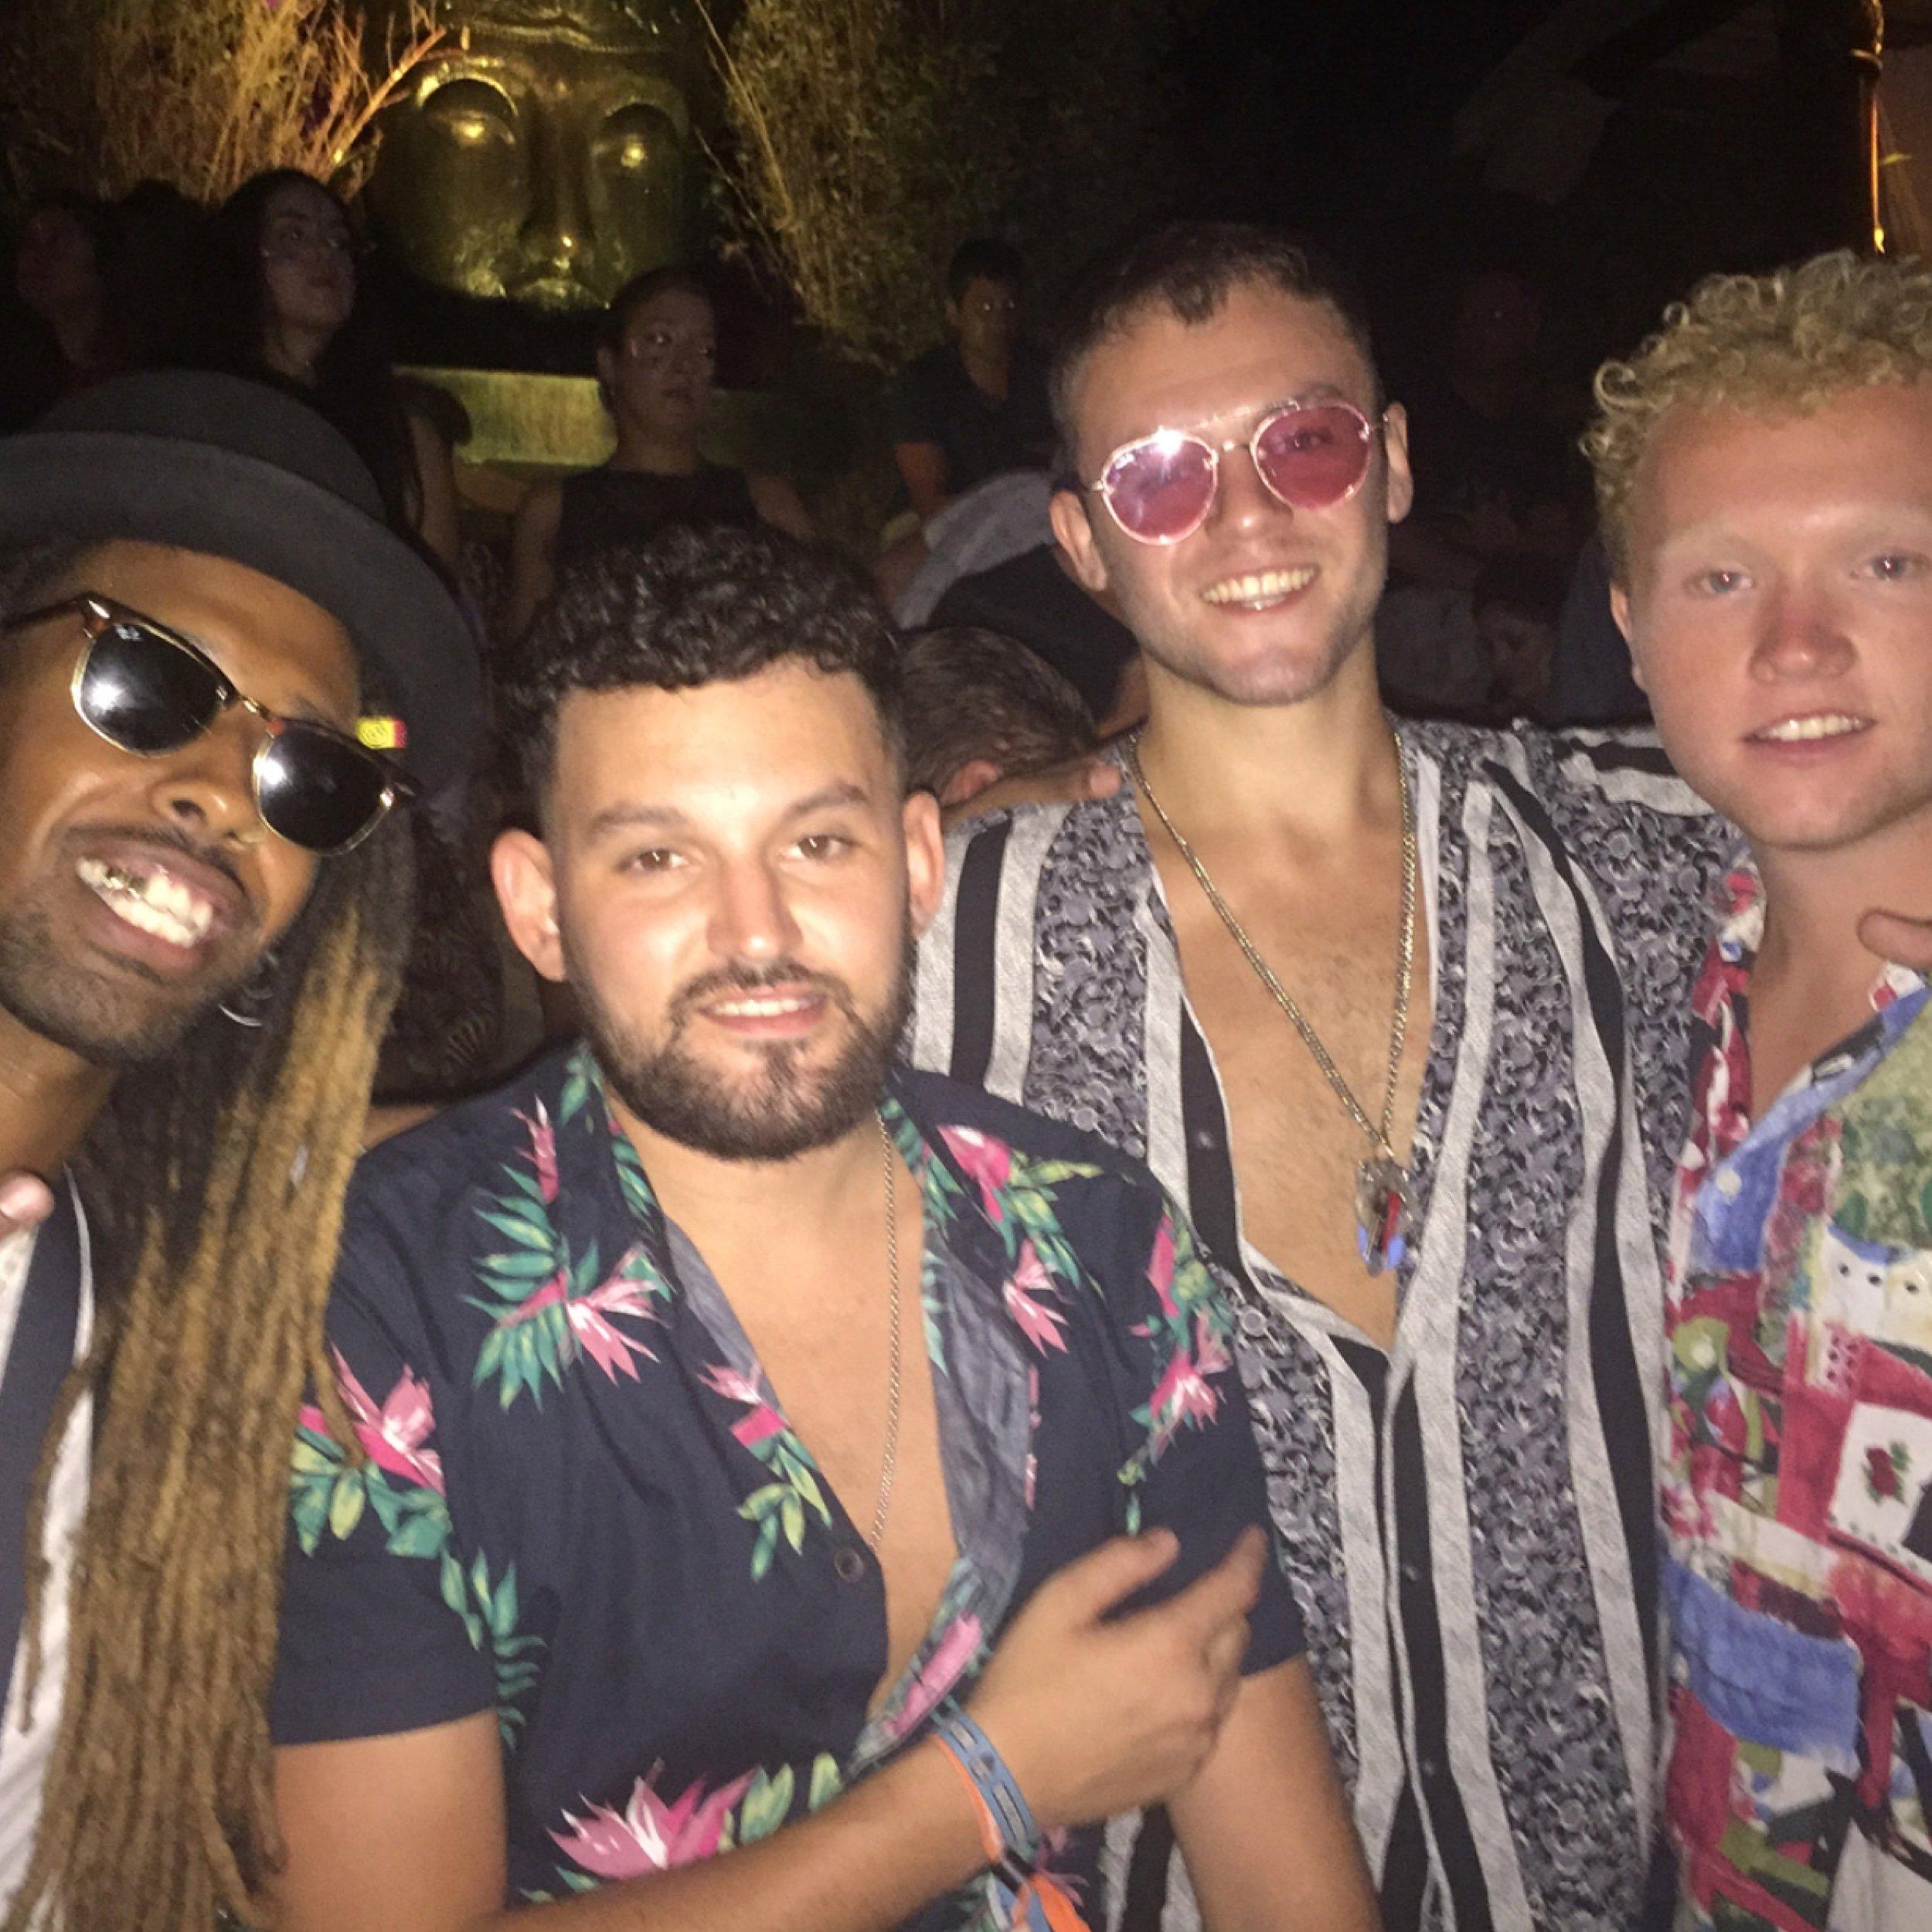 Me with my brothers Bilal, CJ, and John and Woo-Moon Ibiza.